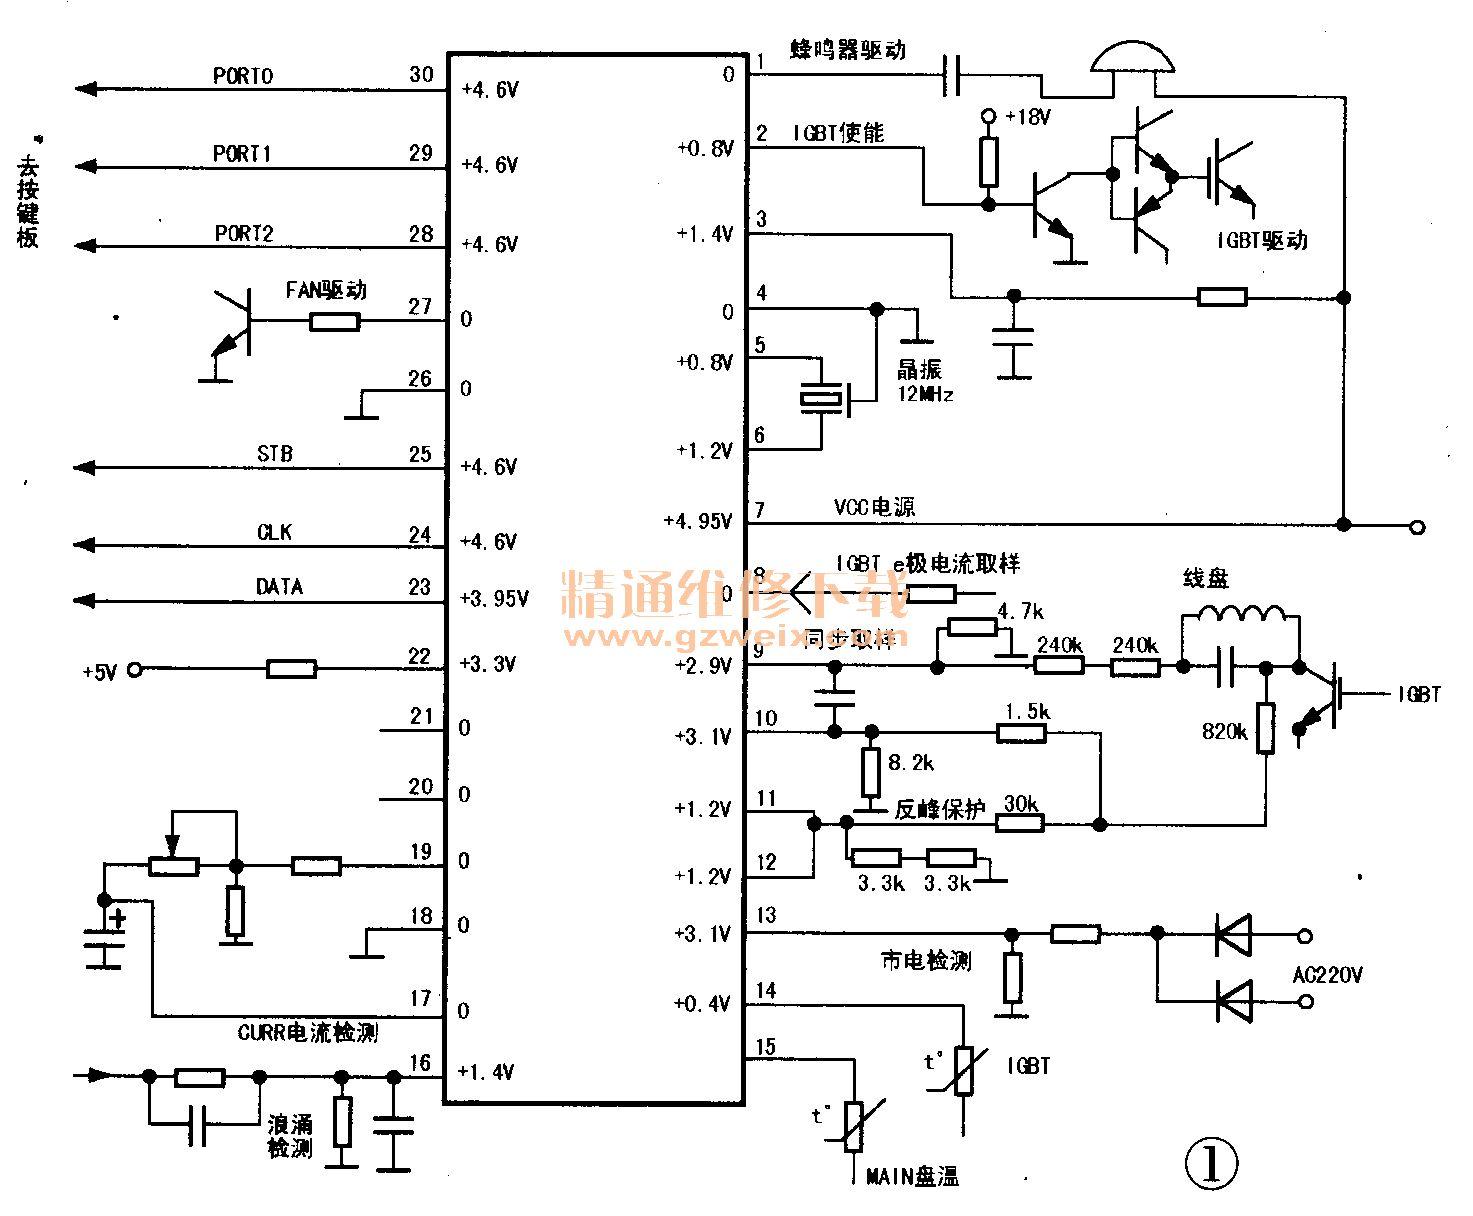 sk2105电路图_美的SK2111型电磁炉不通电故障 - 精通维修下载